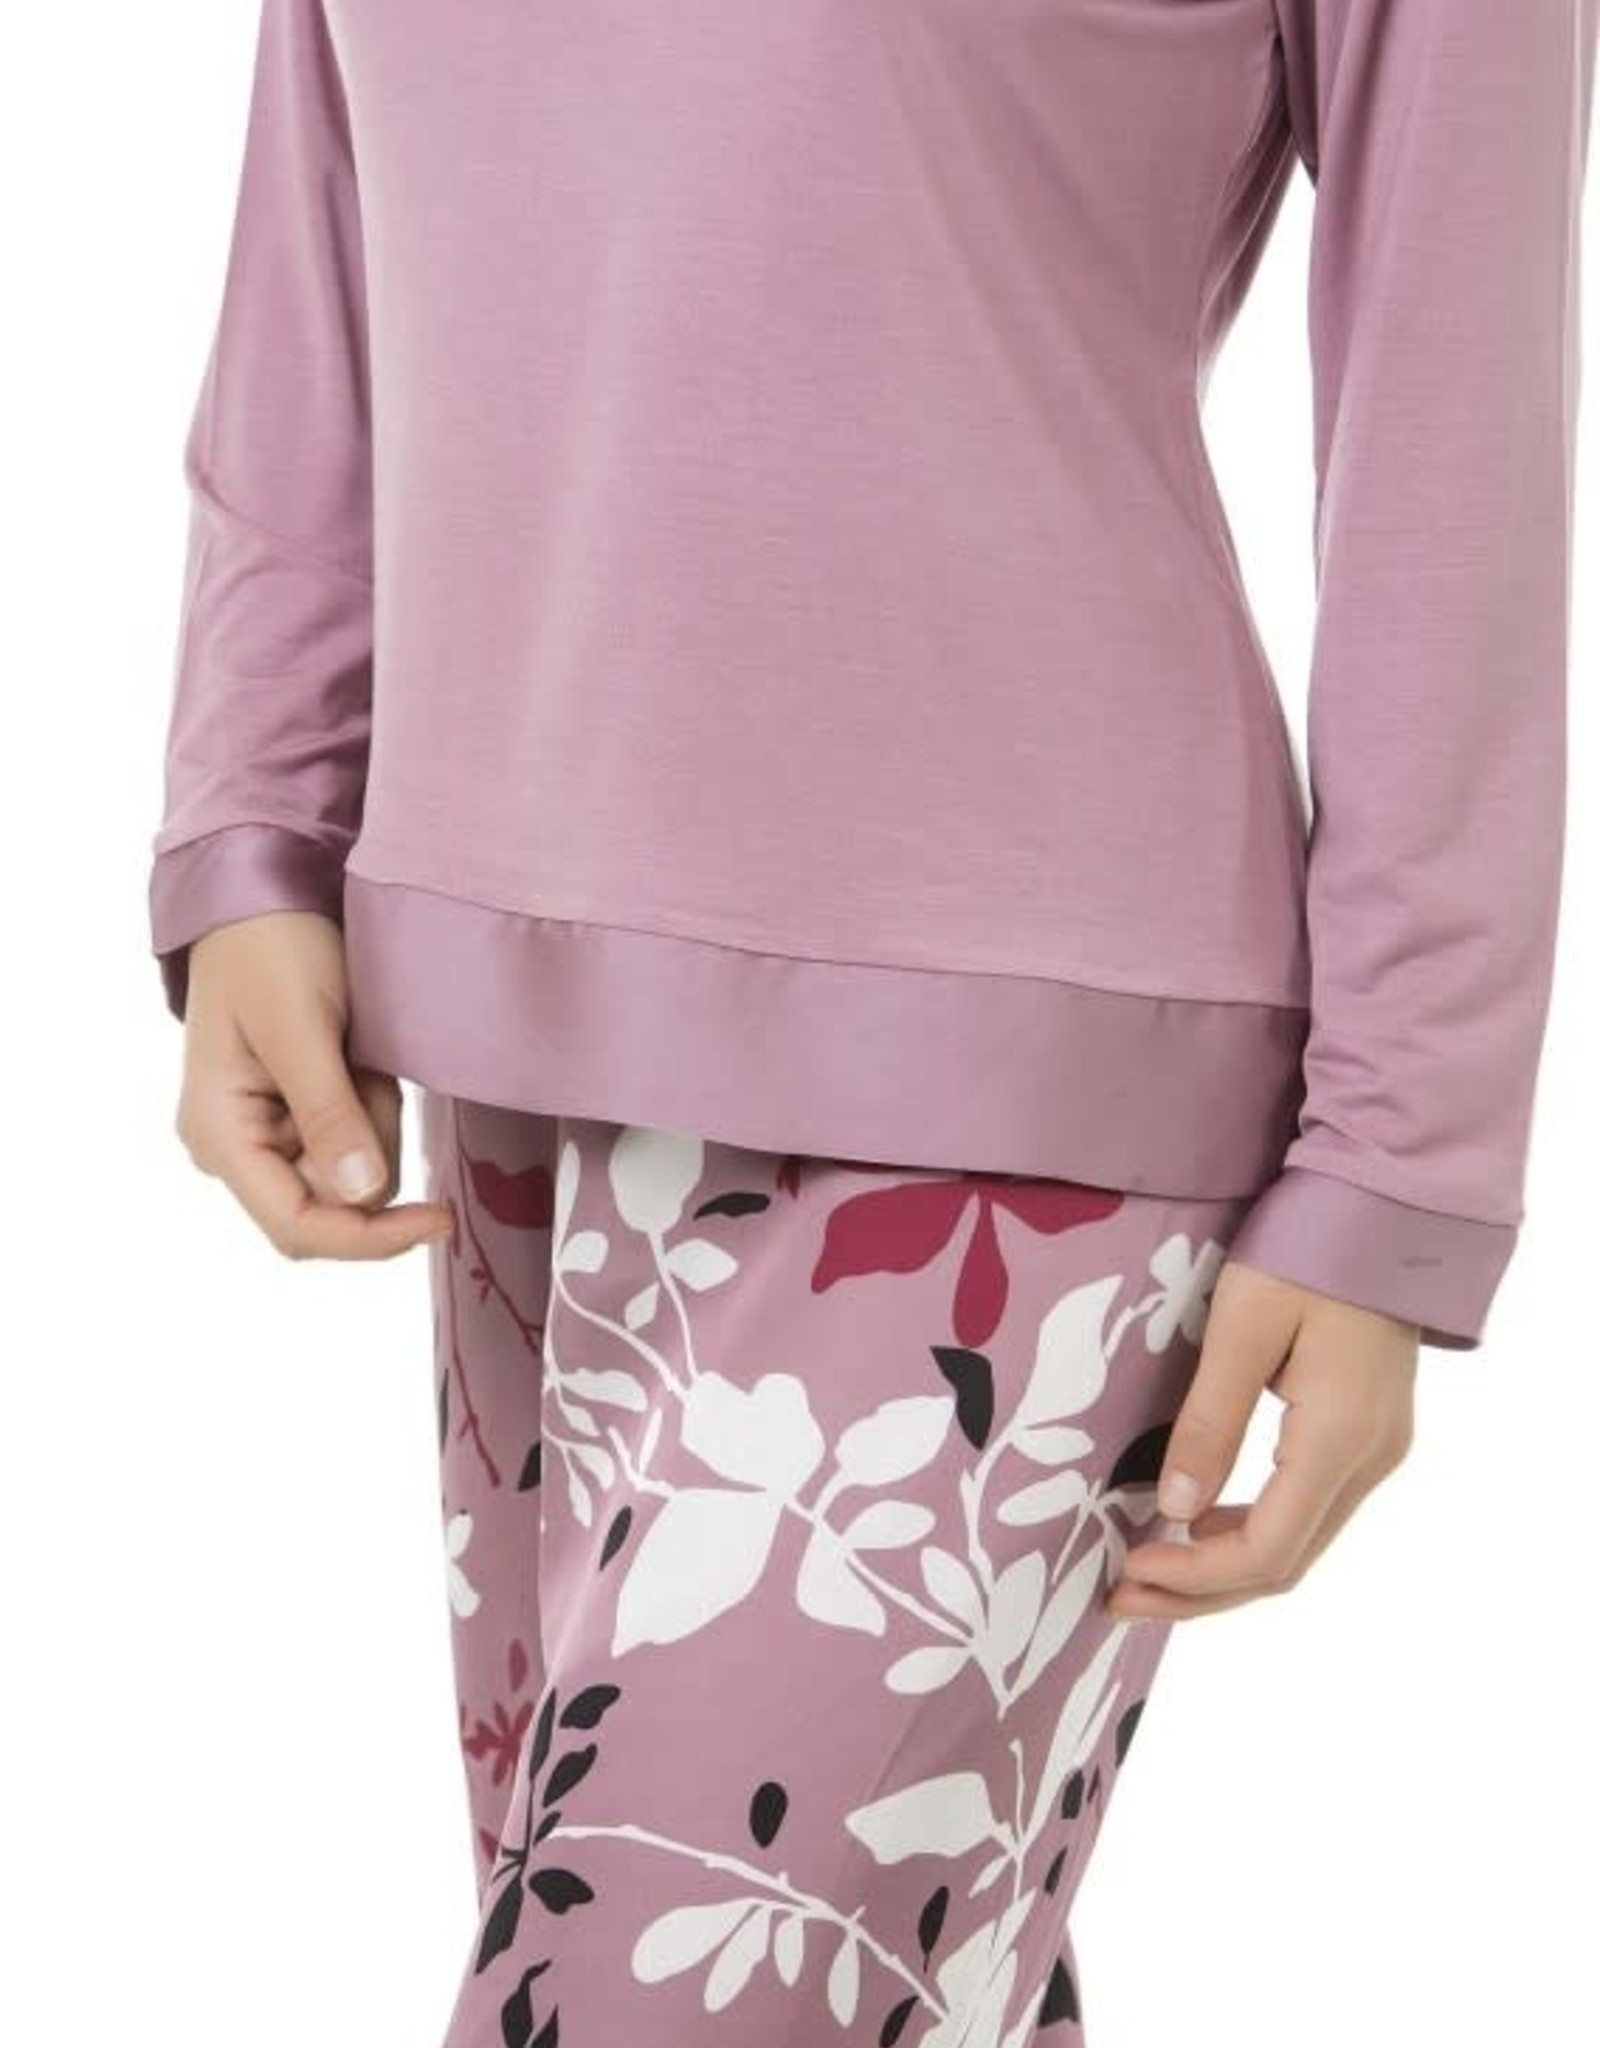 Selmark Pyjama 2 pcs Manches Longues Pantalon Long Satiné Motif Floral Selmark P0973